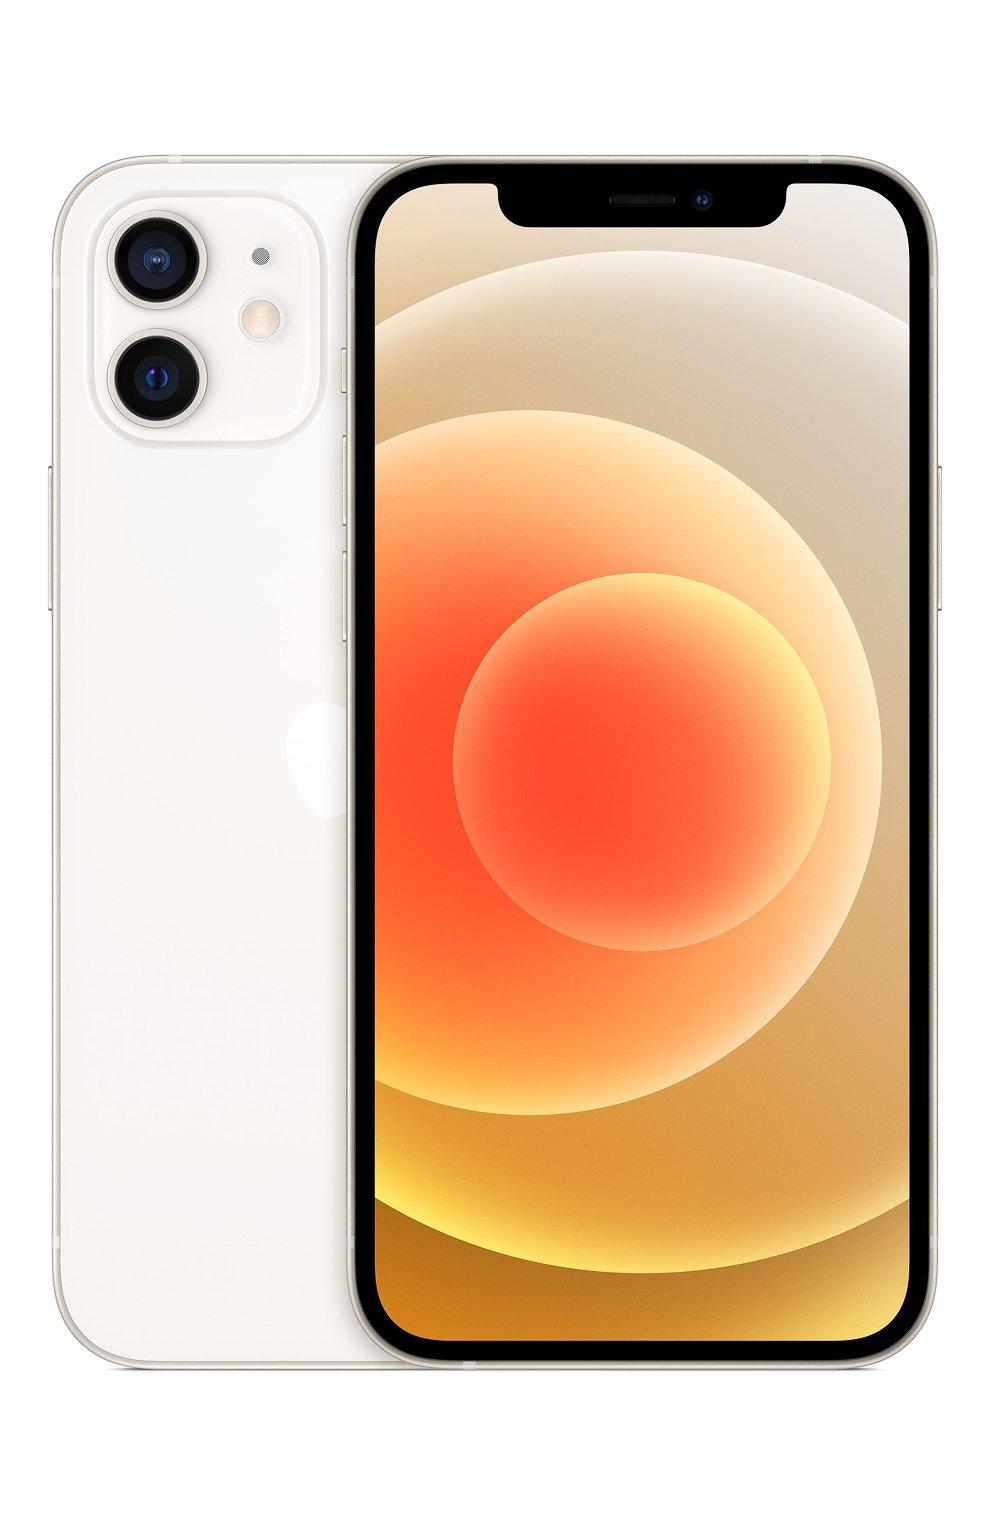 Мужские iphone 12 256gb white APPLE  white цвета, арт. MGJH3RU/A | Фото 1